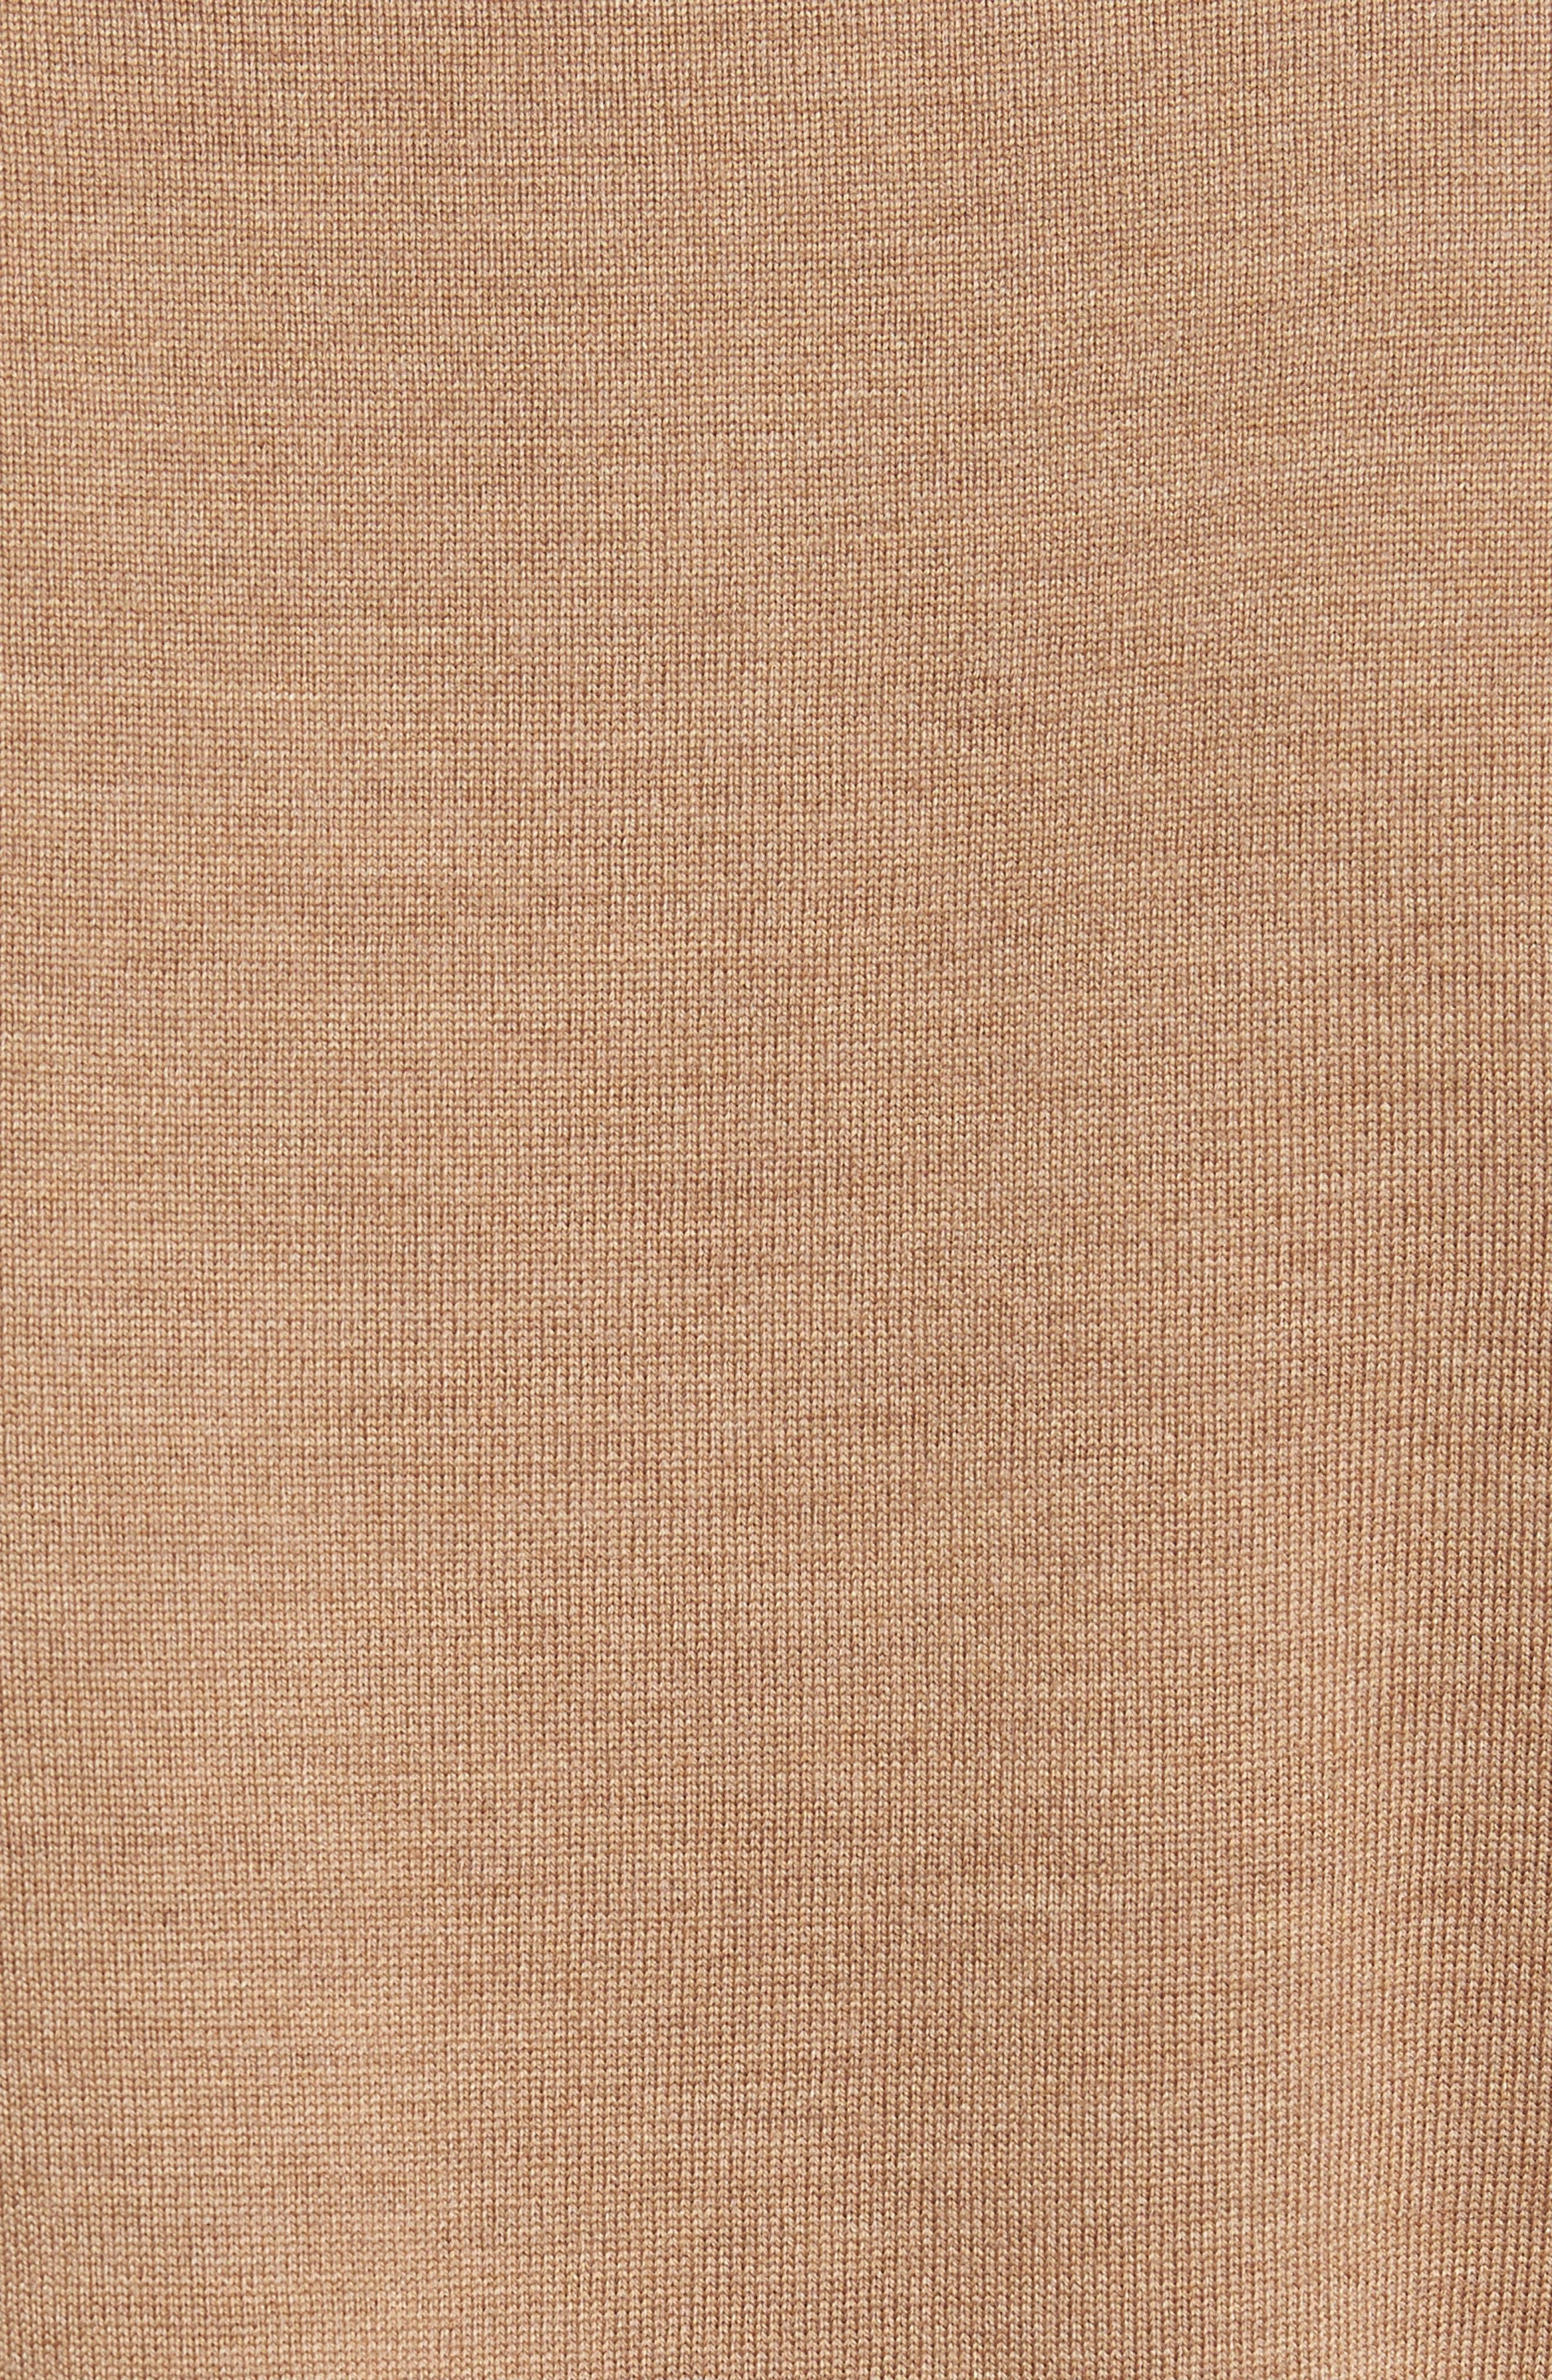 NORDSTROM MEN'S SHOP,                             Merino Wool Polo Sweater,                             Alternate thumbnail 5, color,                             211